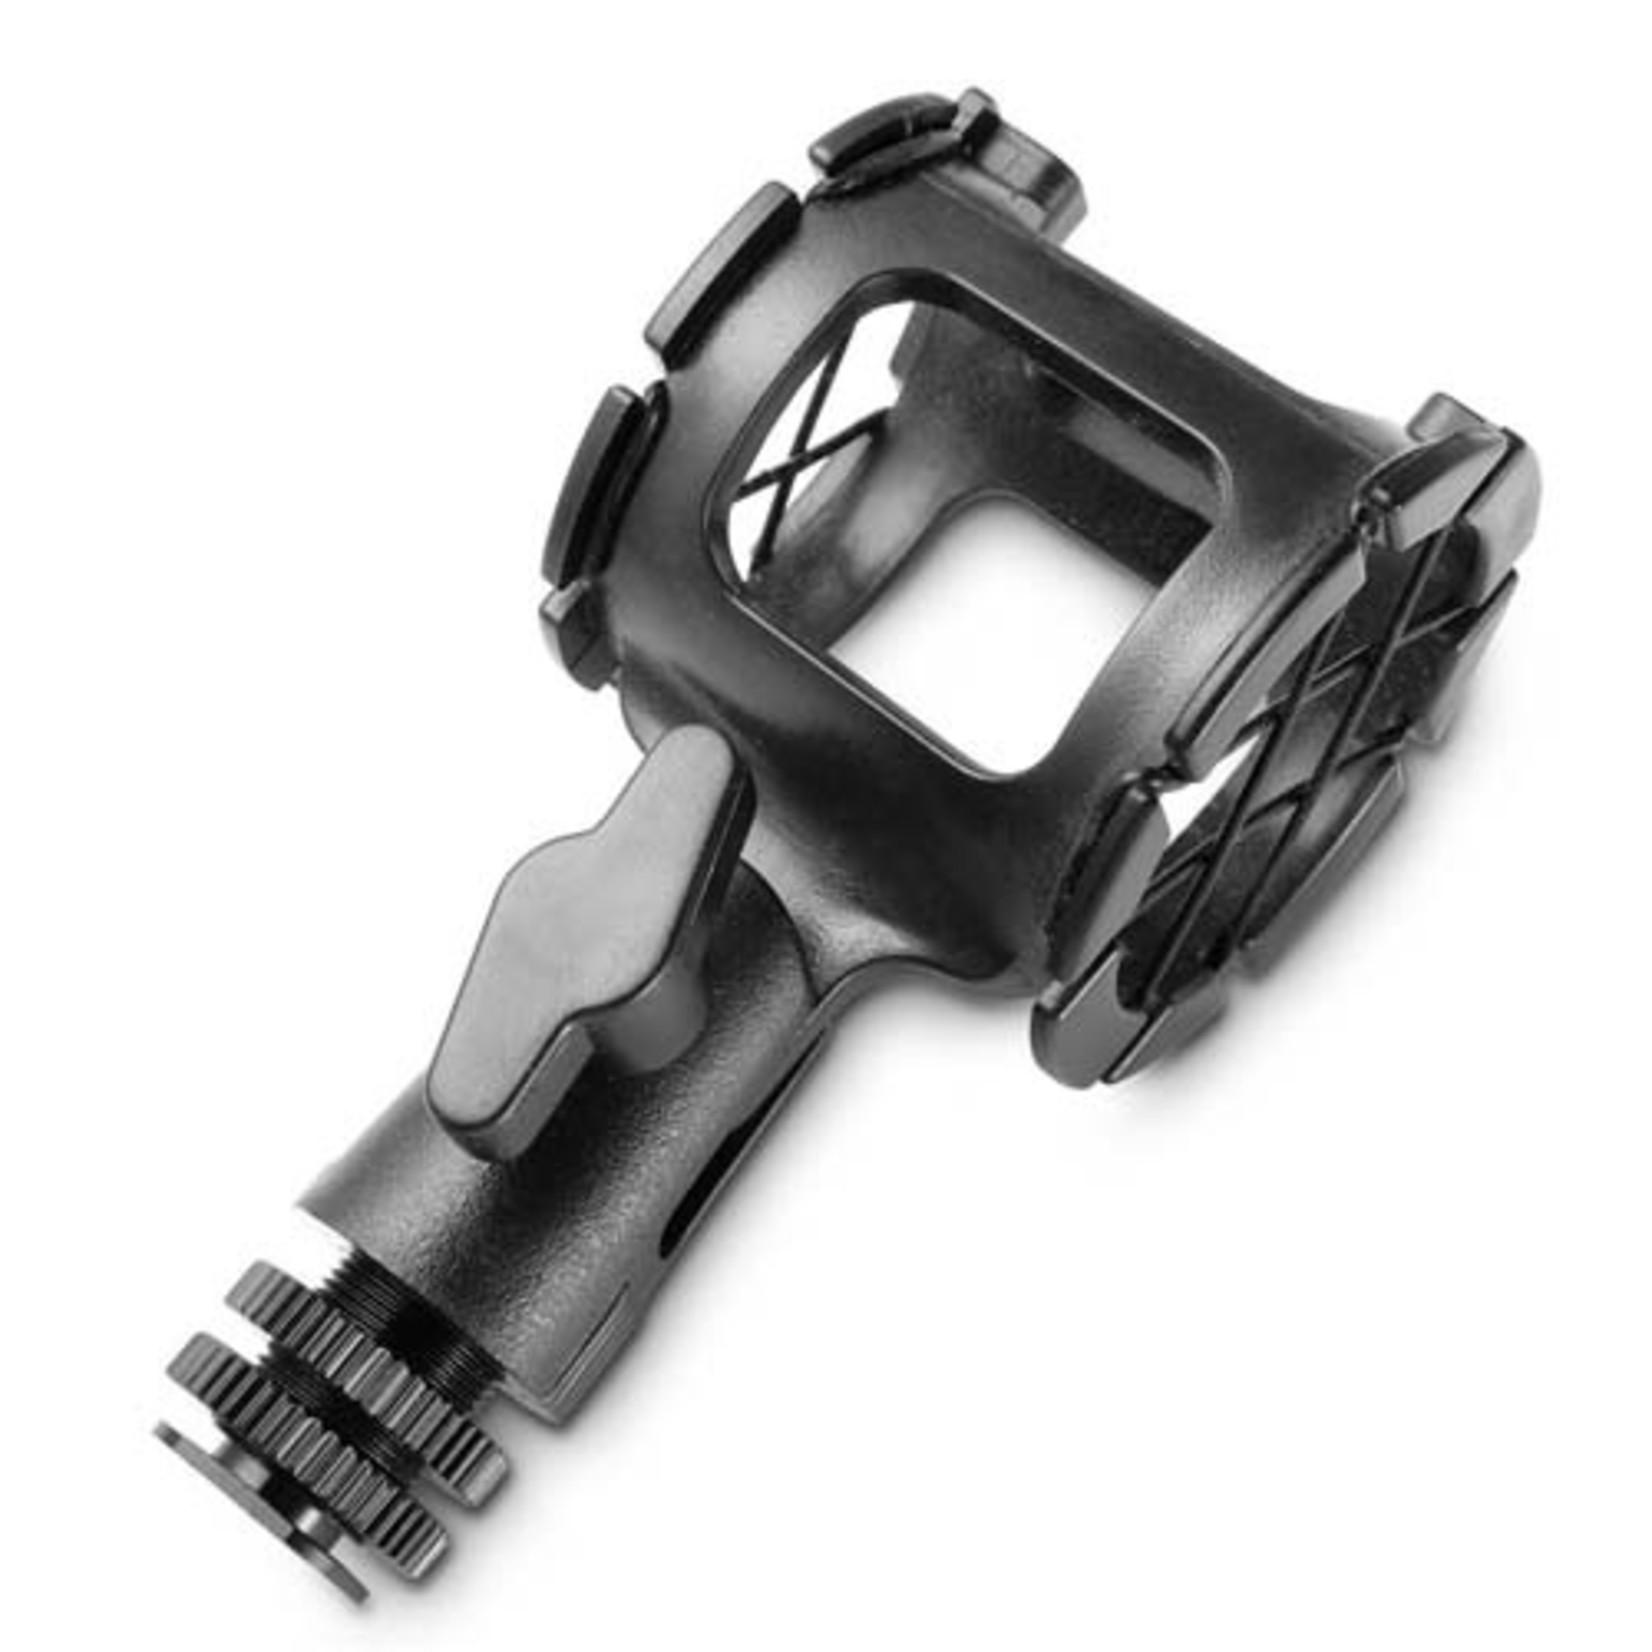 SmallRig SMALLRIG Universal Microphone Shock Mount Adapter